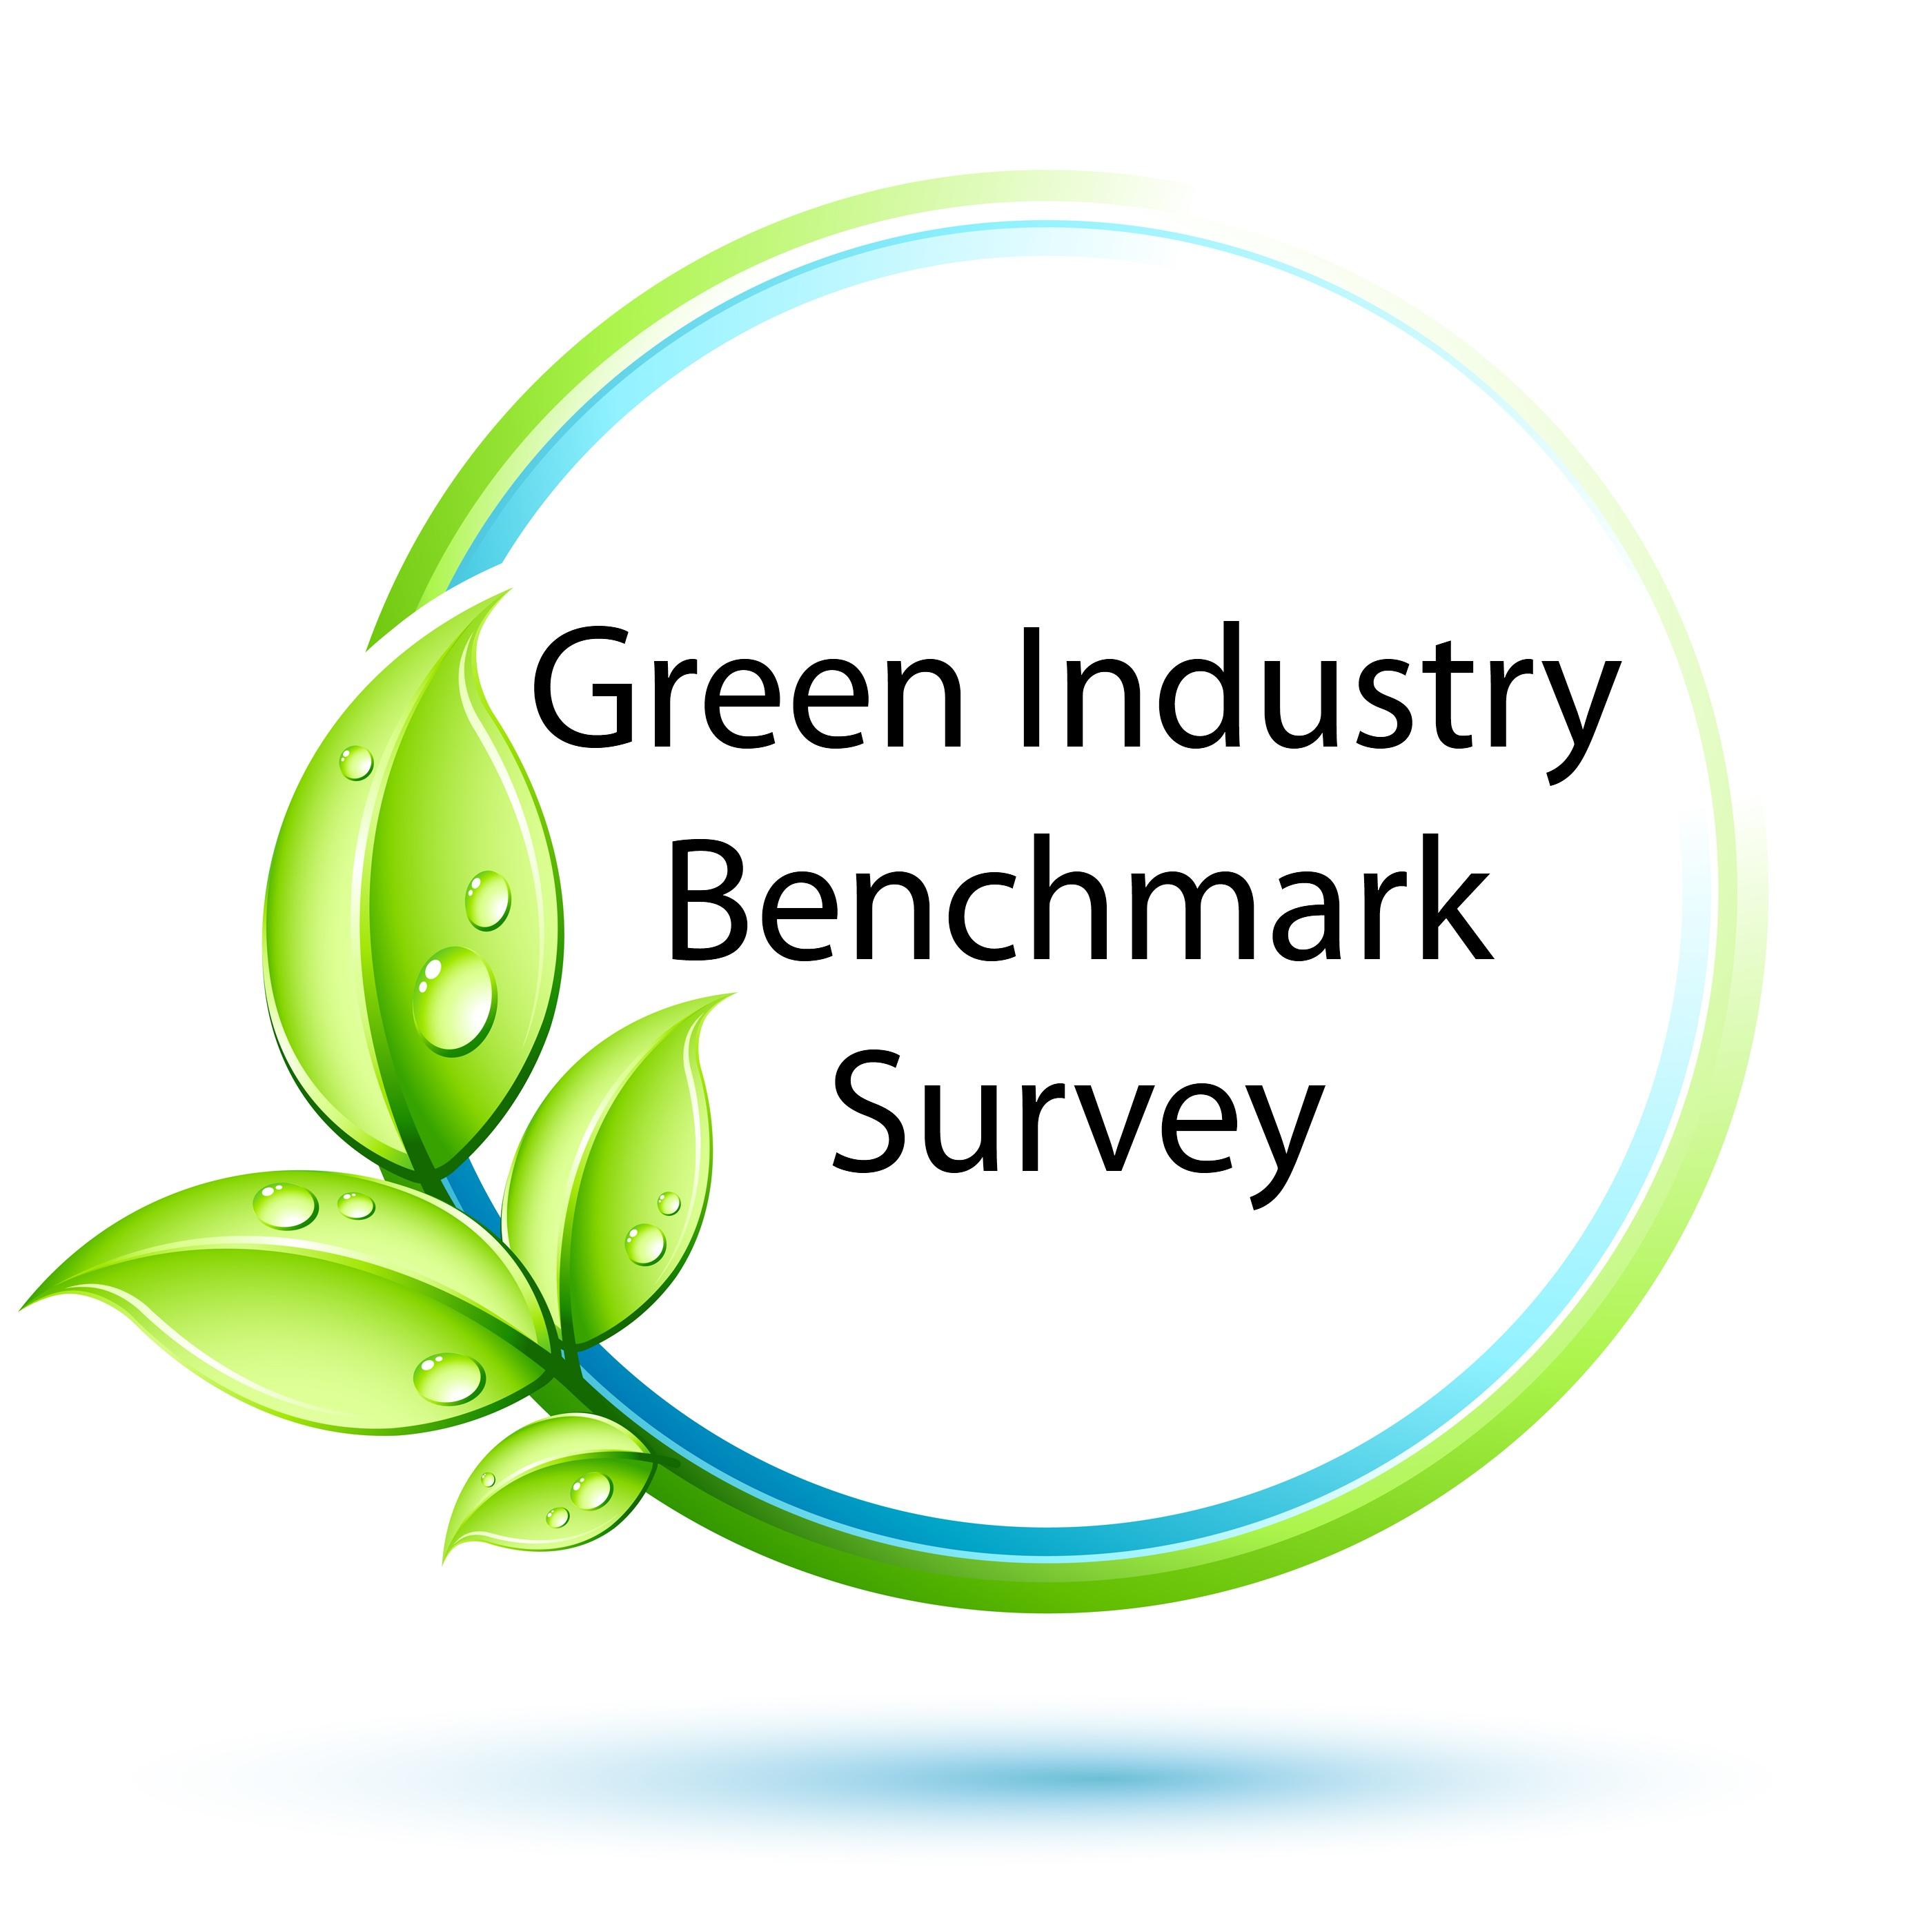 Hindsite Software Surveys Green Industry Professionals